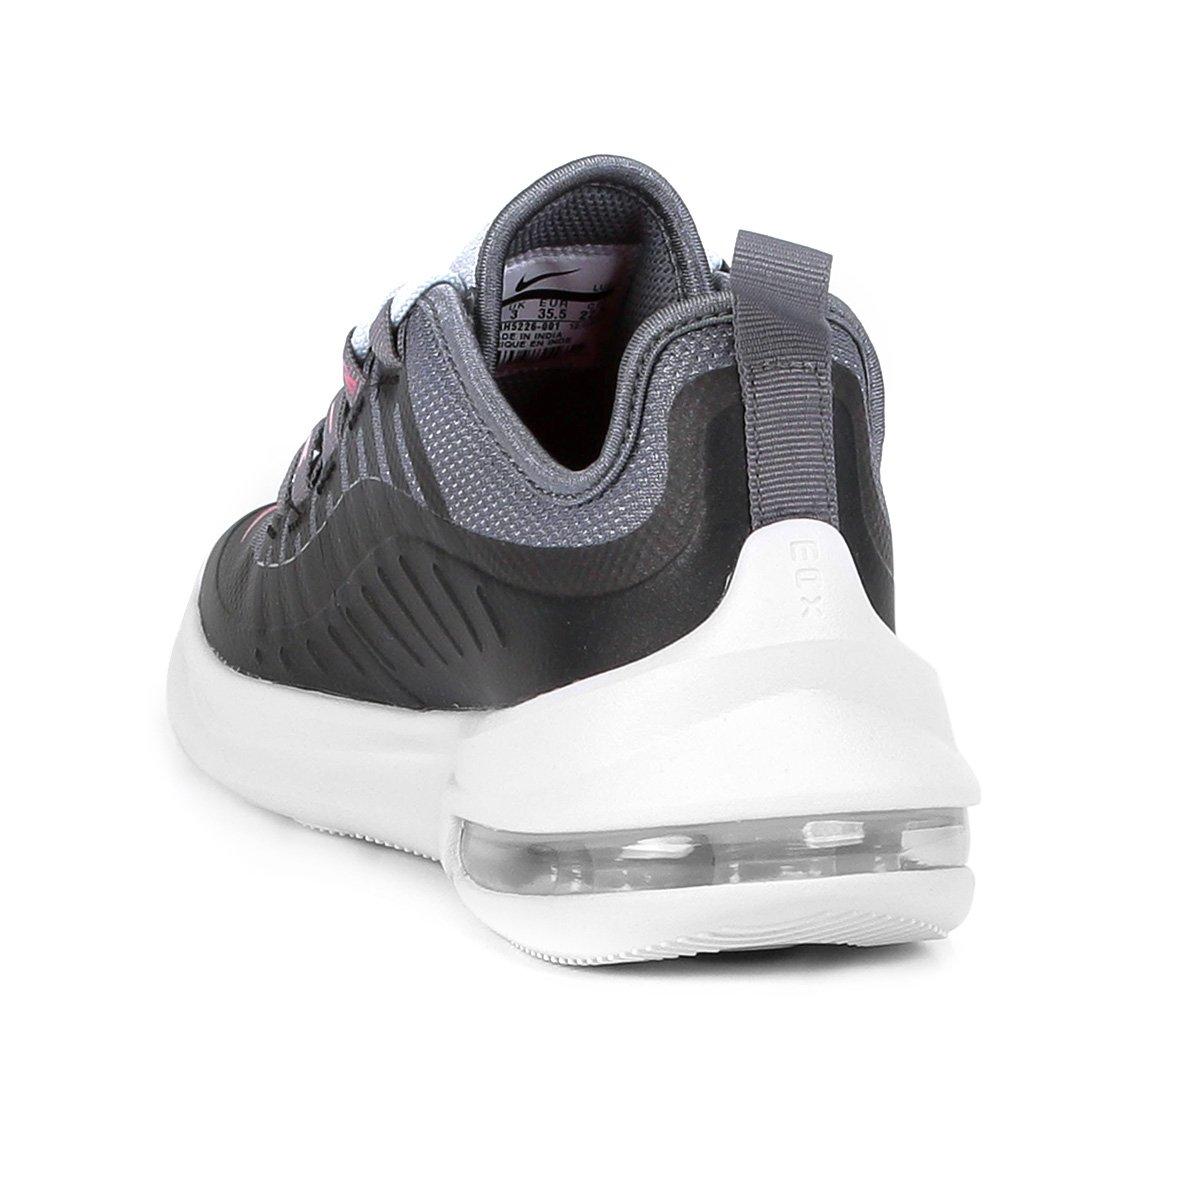 Tênis Infantil Nike Infantil Air Max Axis - Compre Agora  dbd879769c536